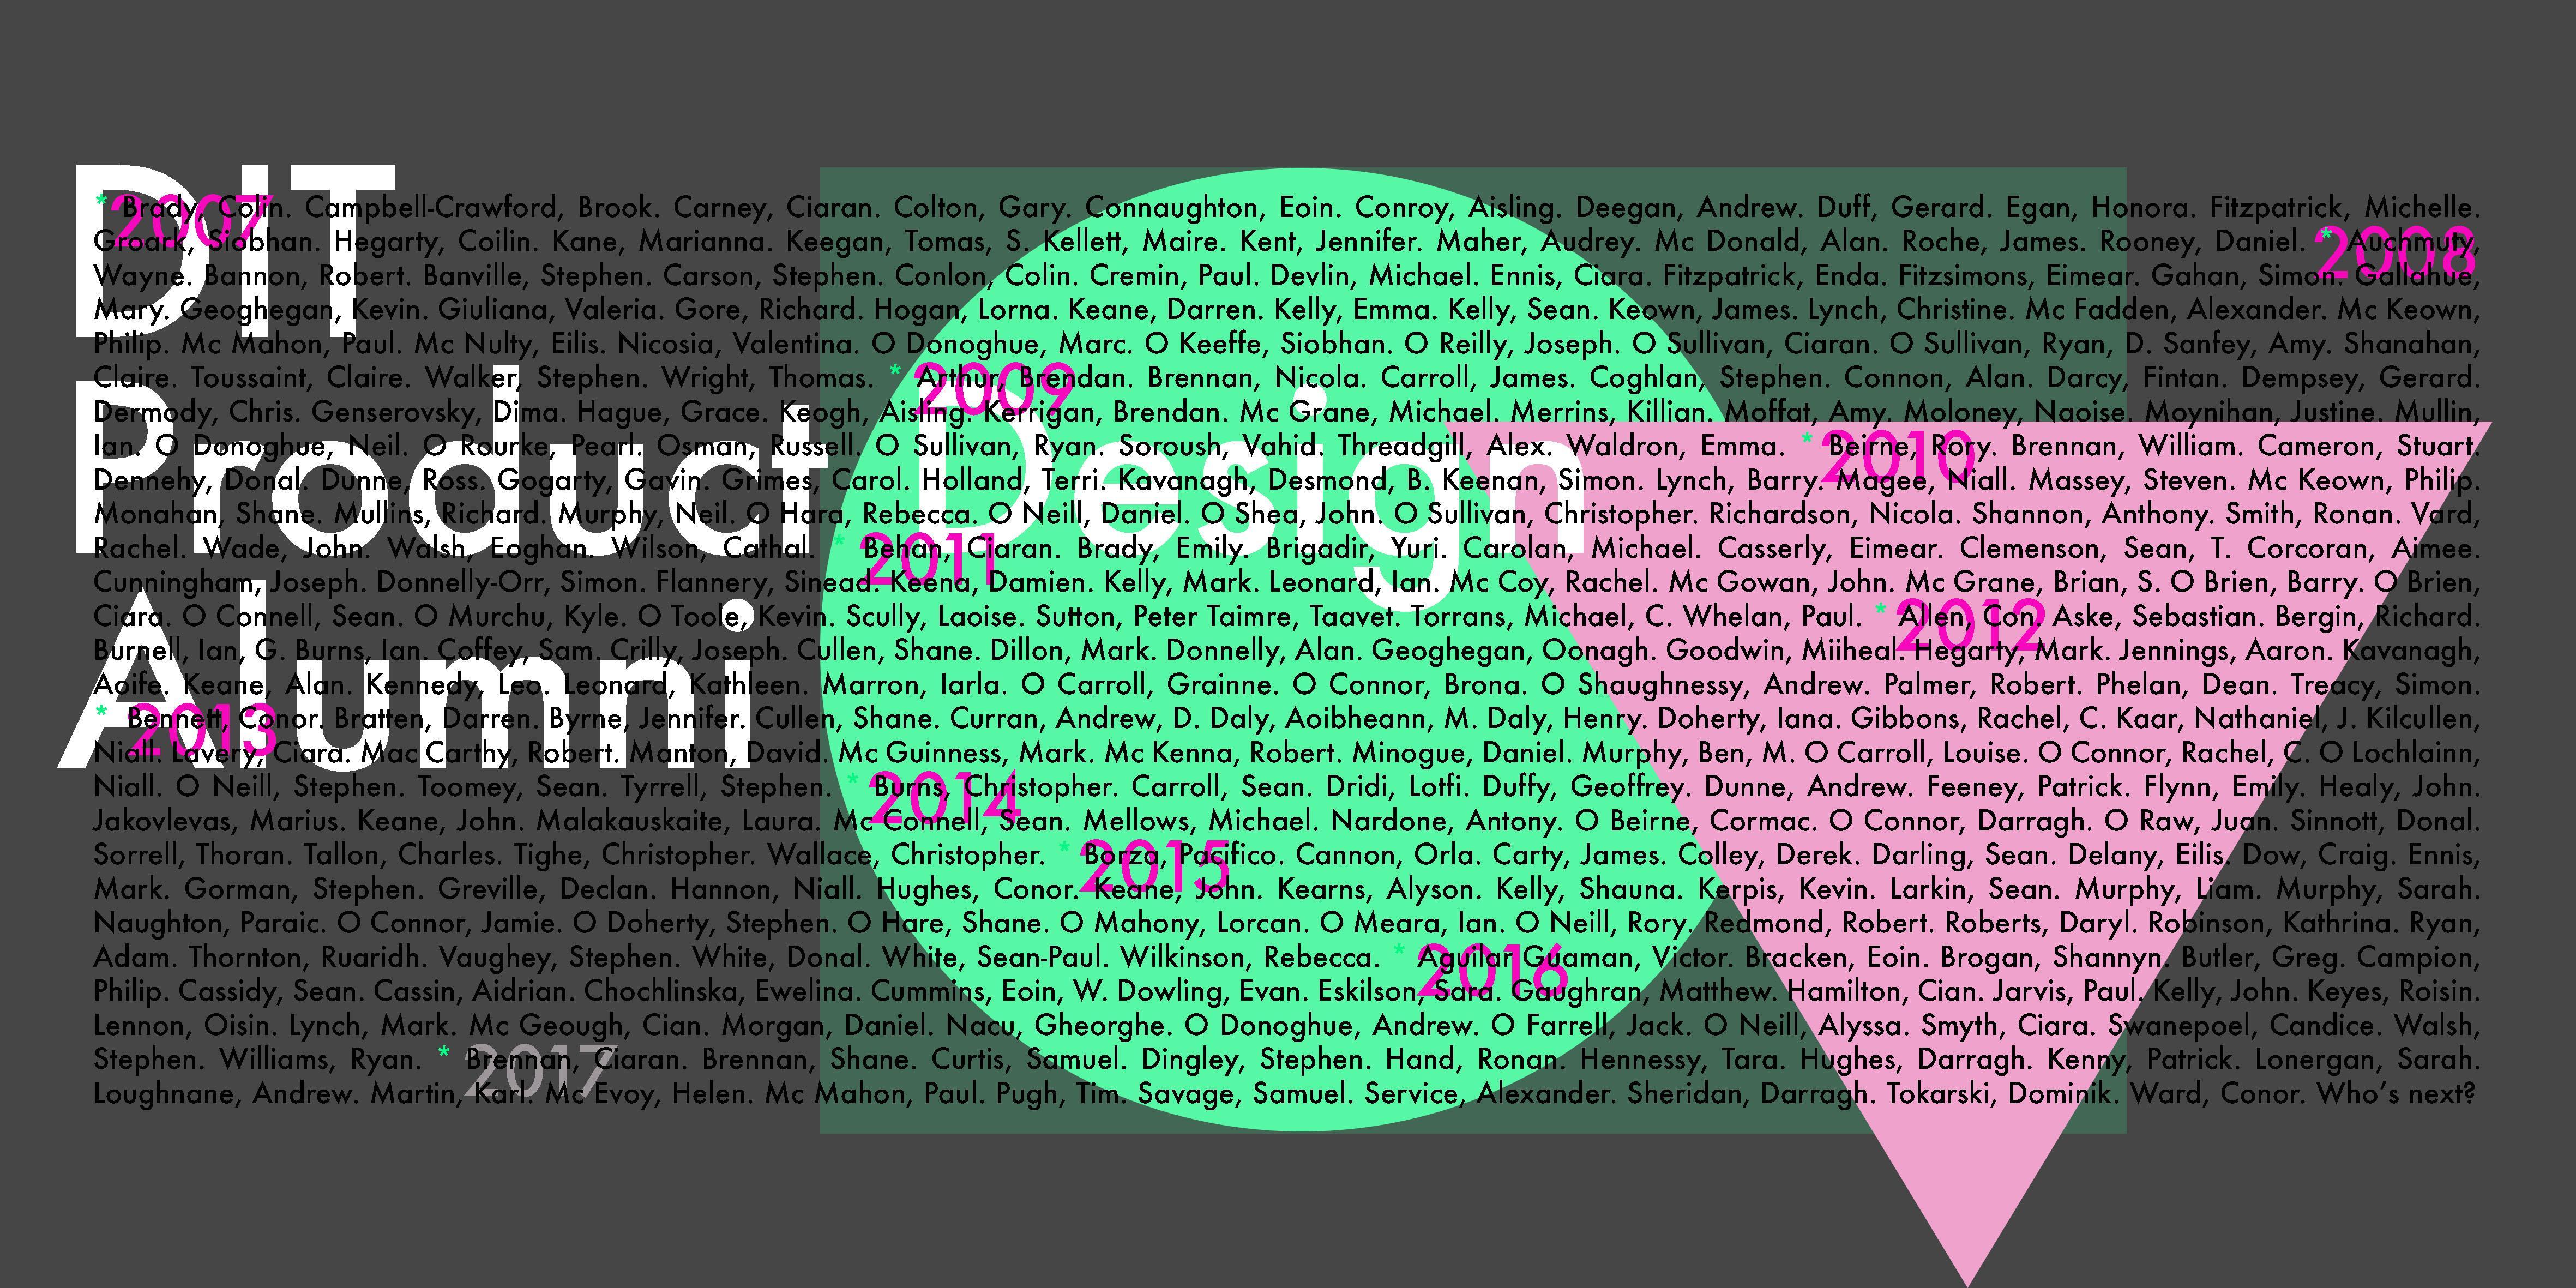 DIT Product Design Alumni Reunion; Celebratin